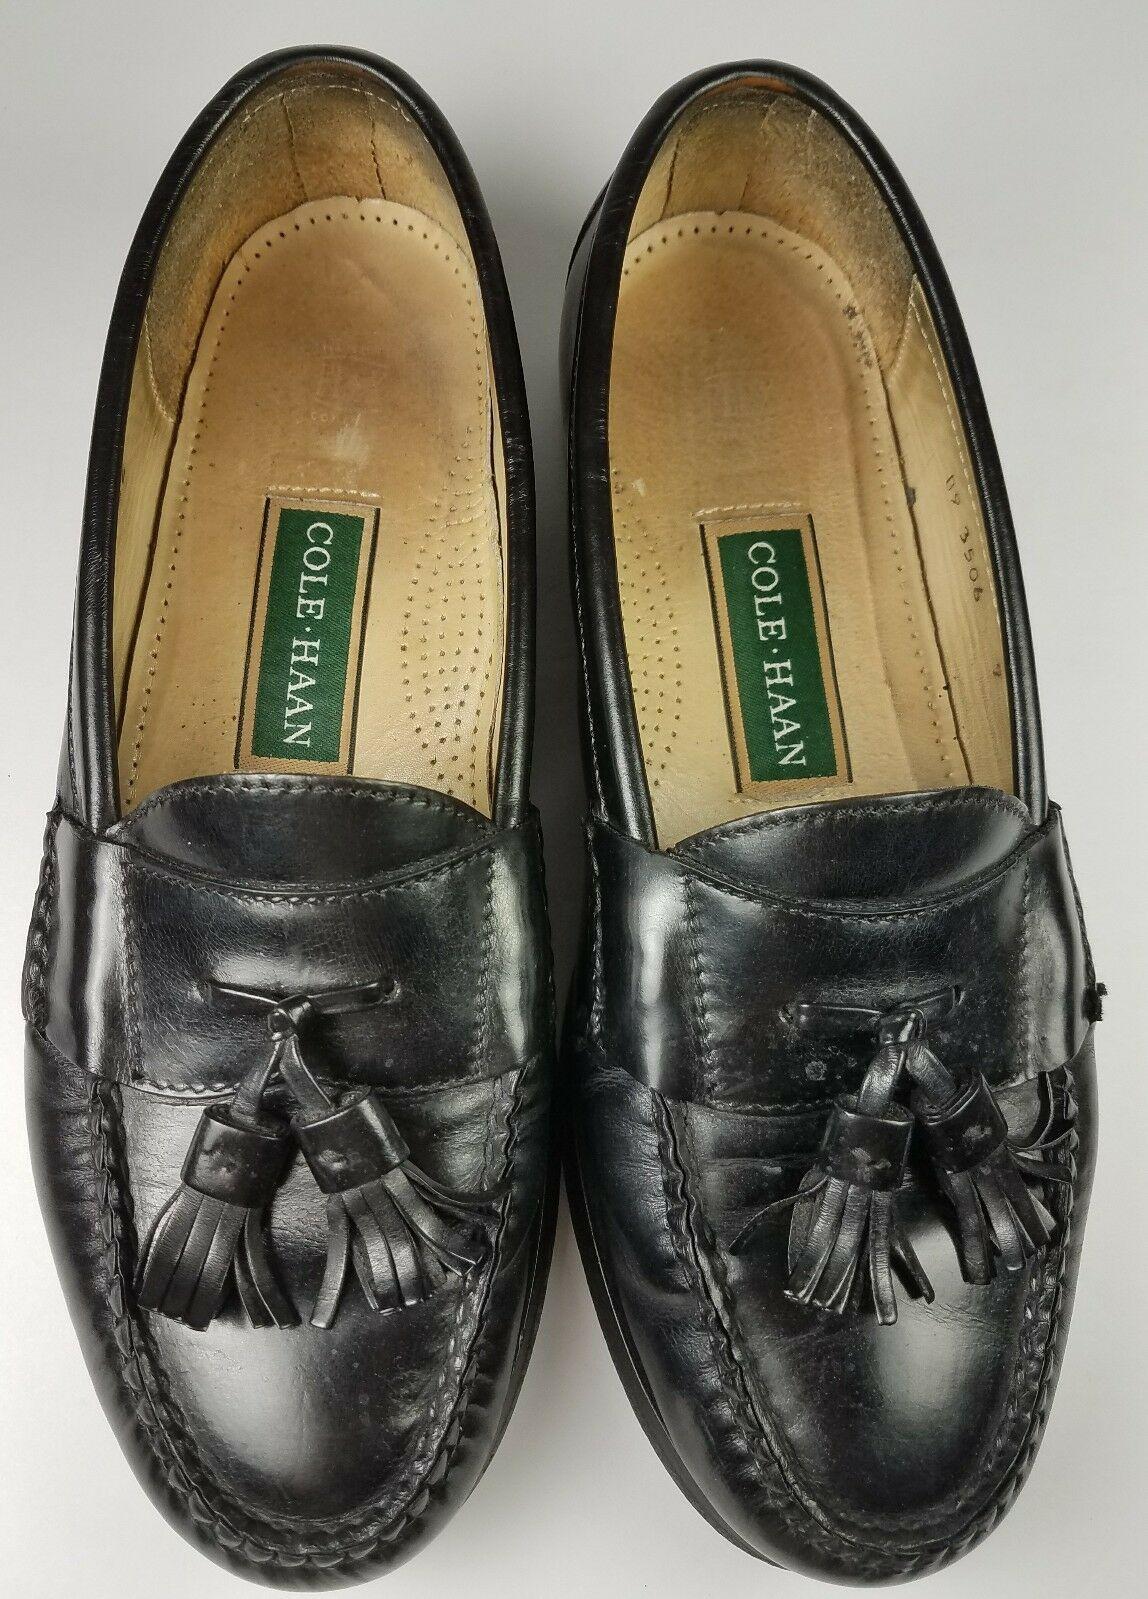 COLE HAAN Men's Loafers 9 D Leather Black Pinch Tassel Slip On Dress Shoes image 7